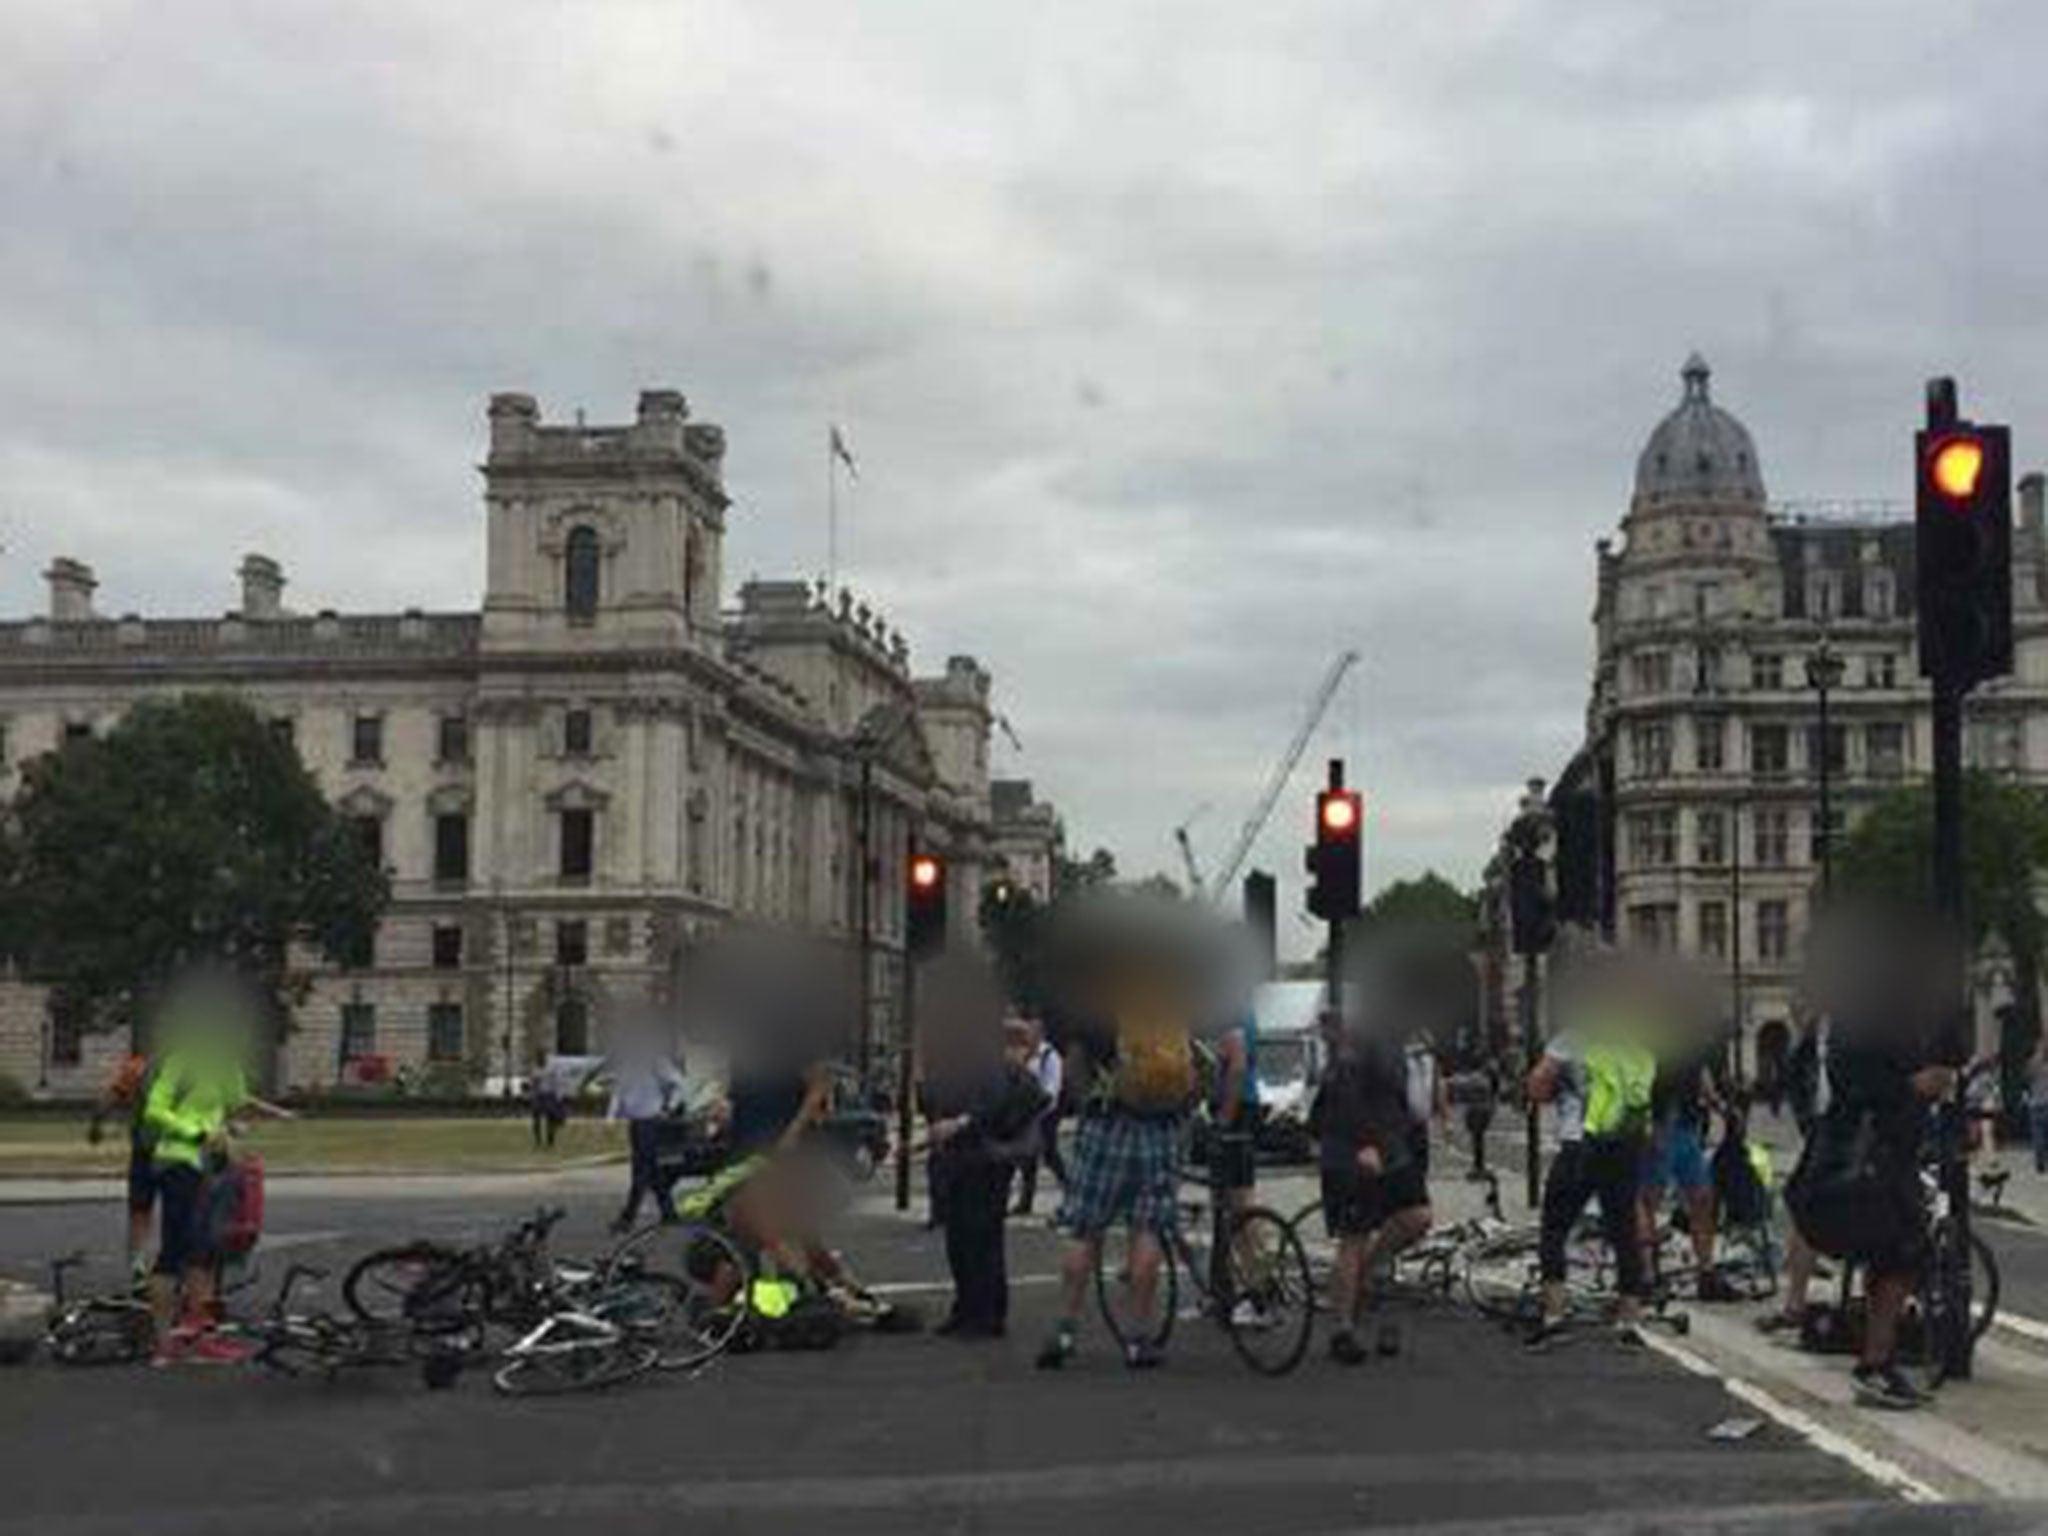 Westminster crash: Salih Khater jailed for life over terror attack outside parliament